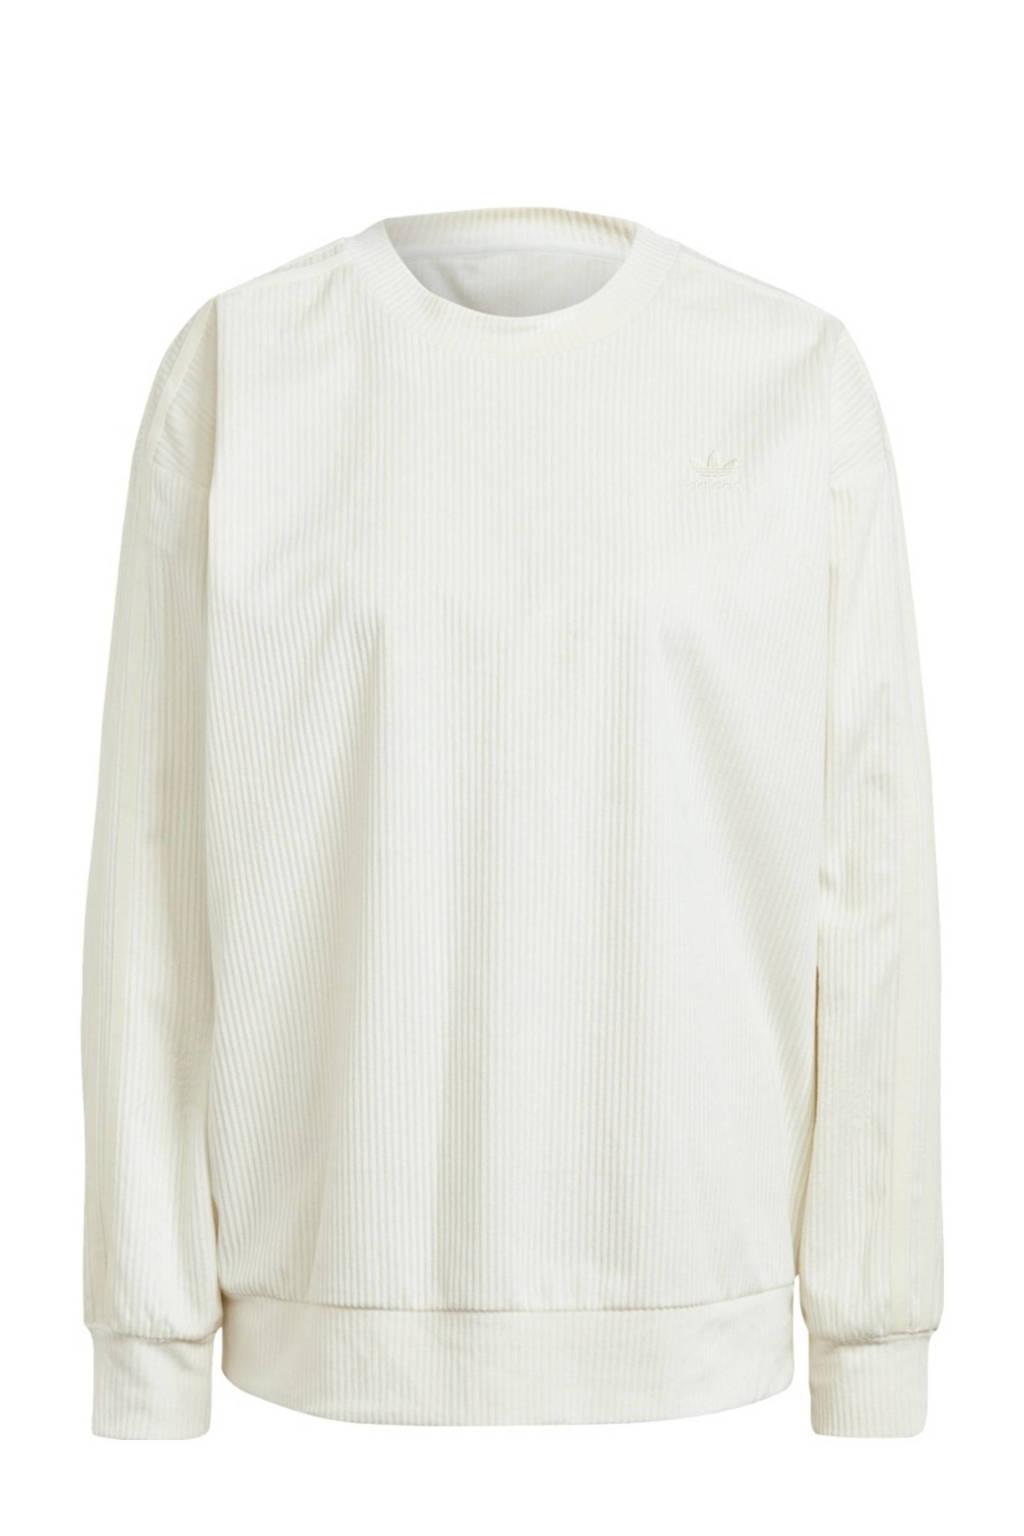 adidas Originals Corduroy sweater wit, Crème